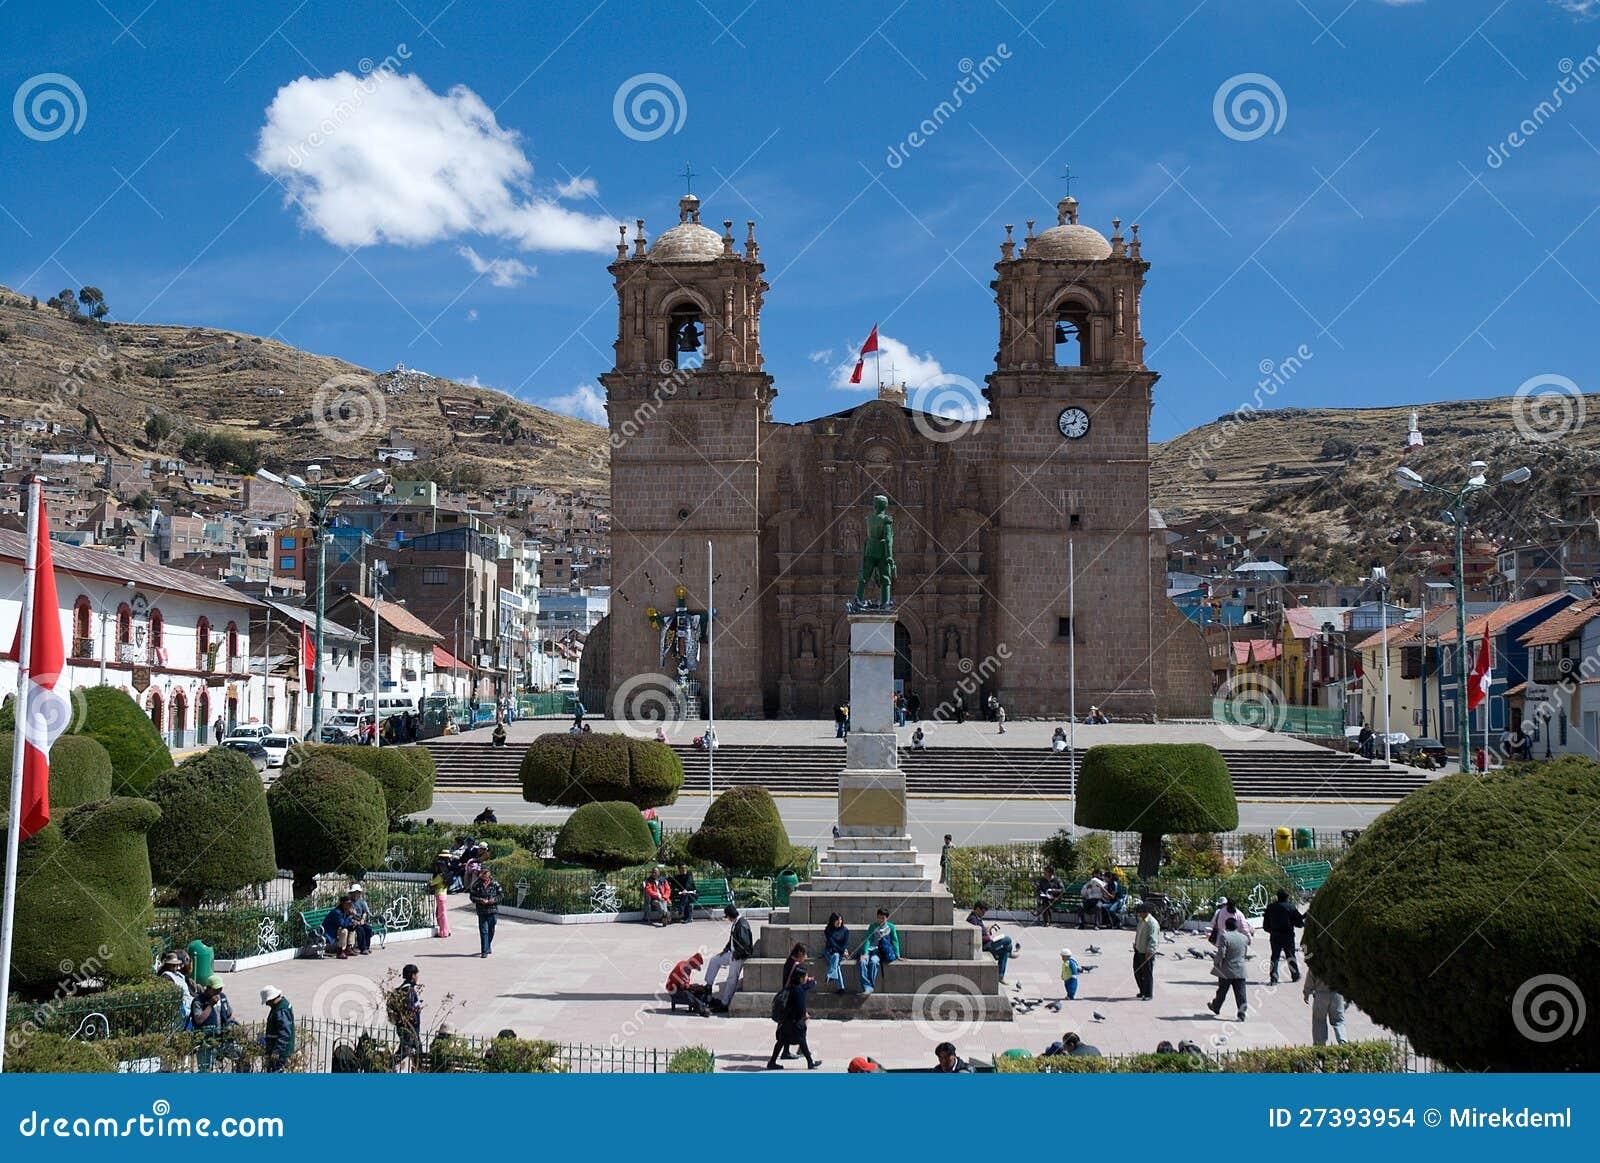 Town Puno, Peru